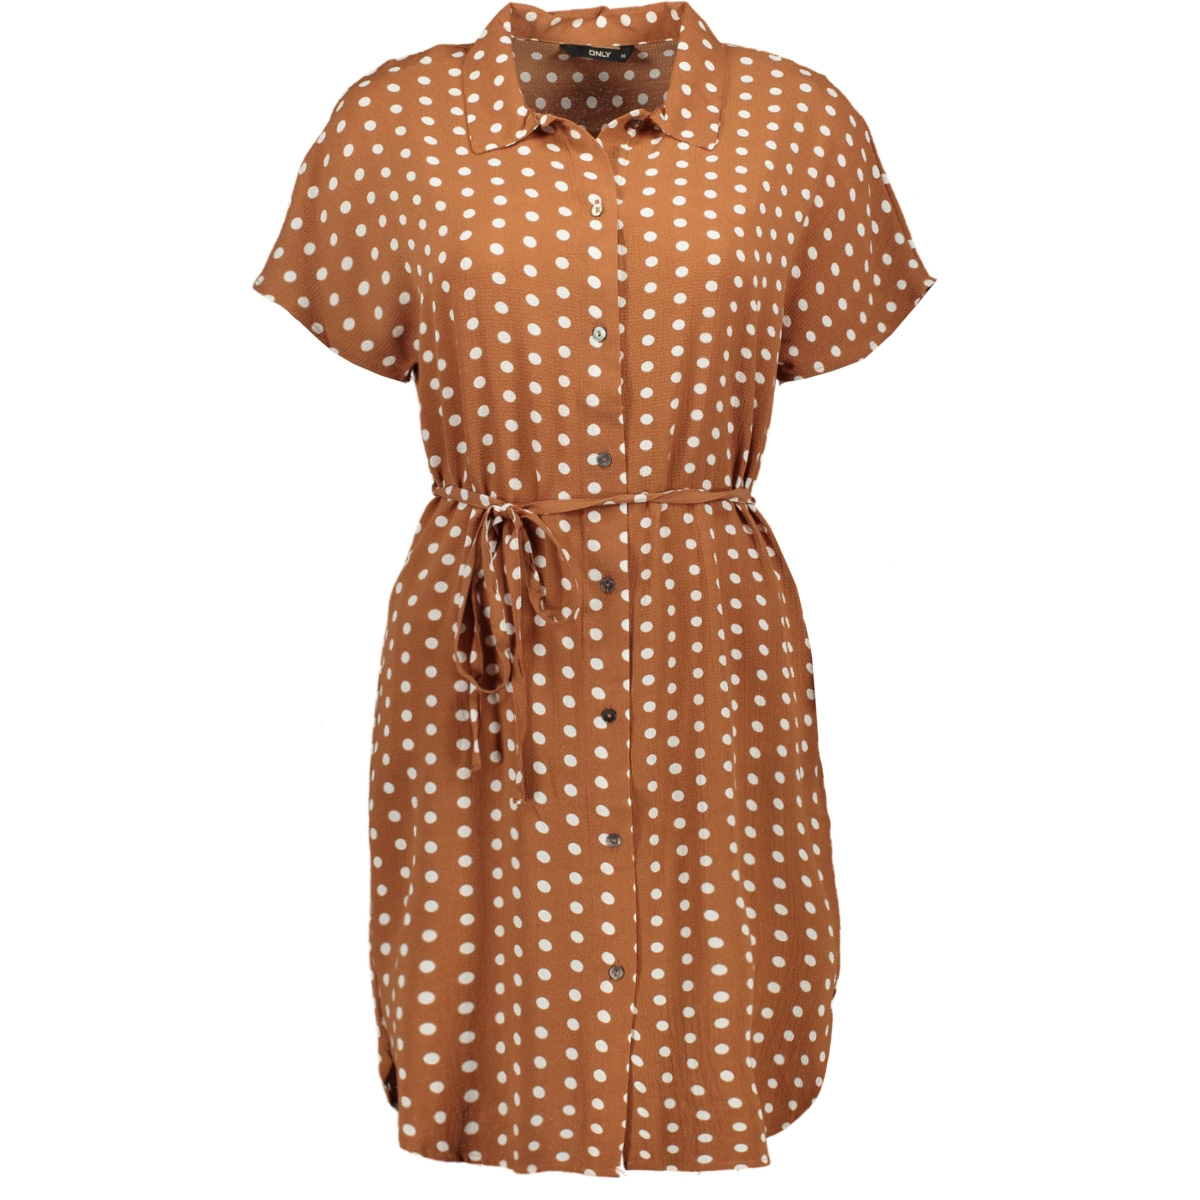 onlnova lux aop s/s shirt dress 7 w 15187479 only jurk ginger bread/pretty dot